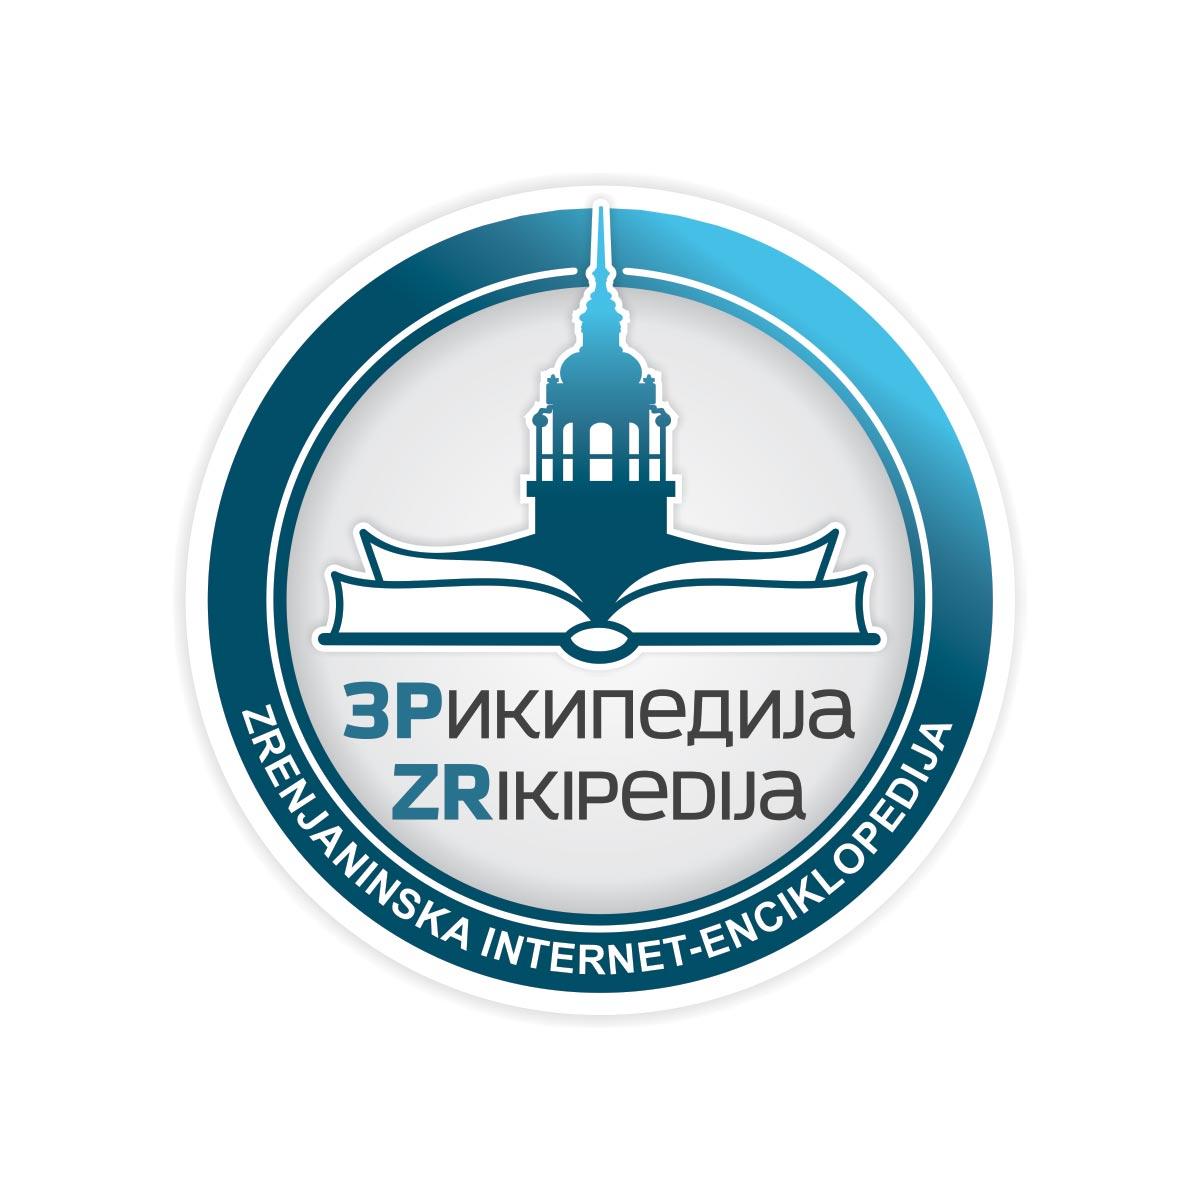 Zrikipedija logo